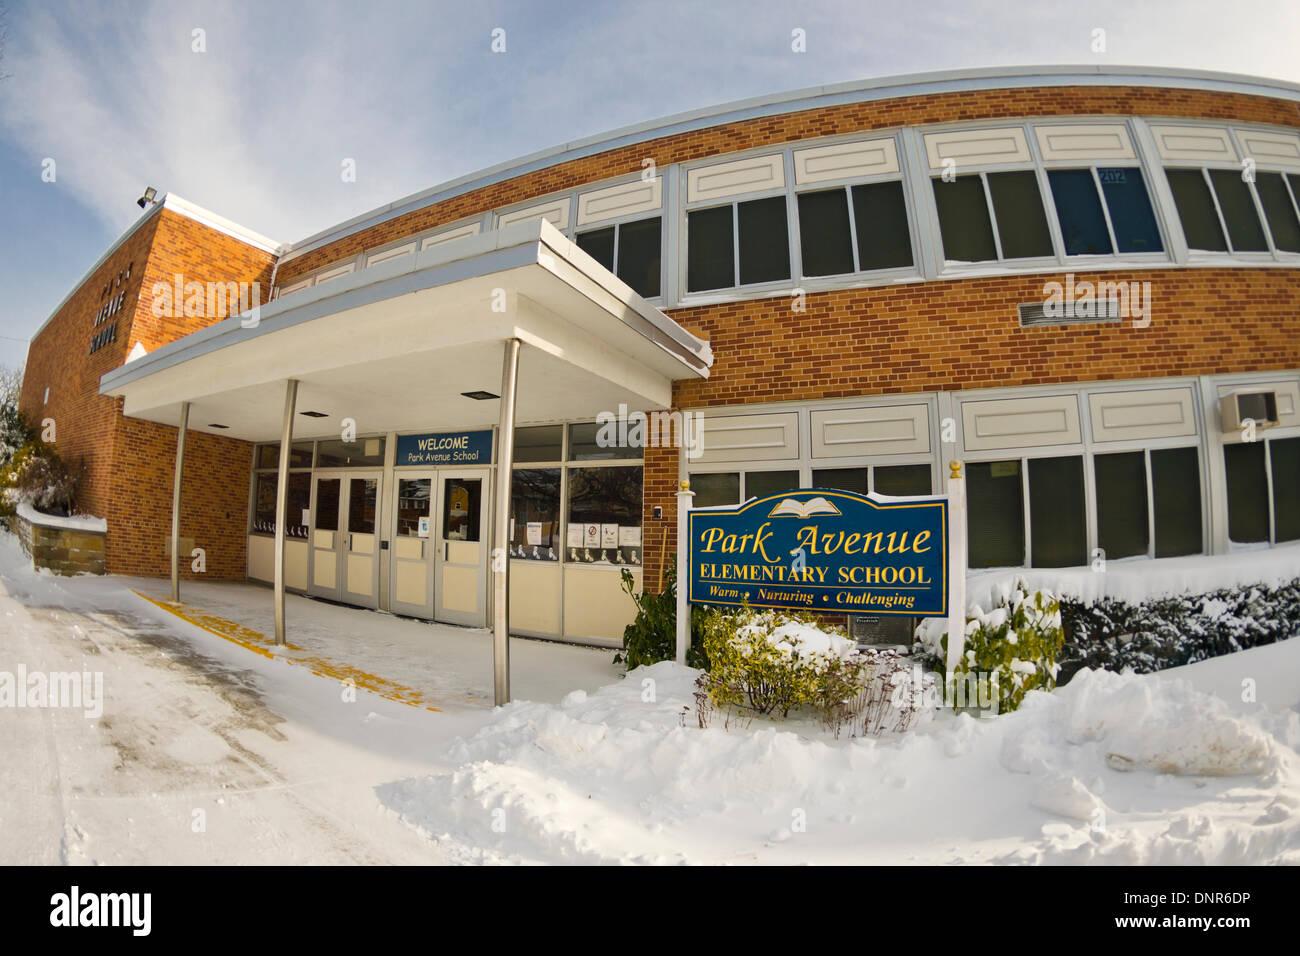 Island Avenue Elementary School